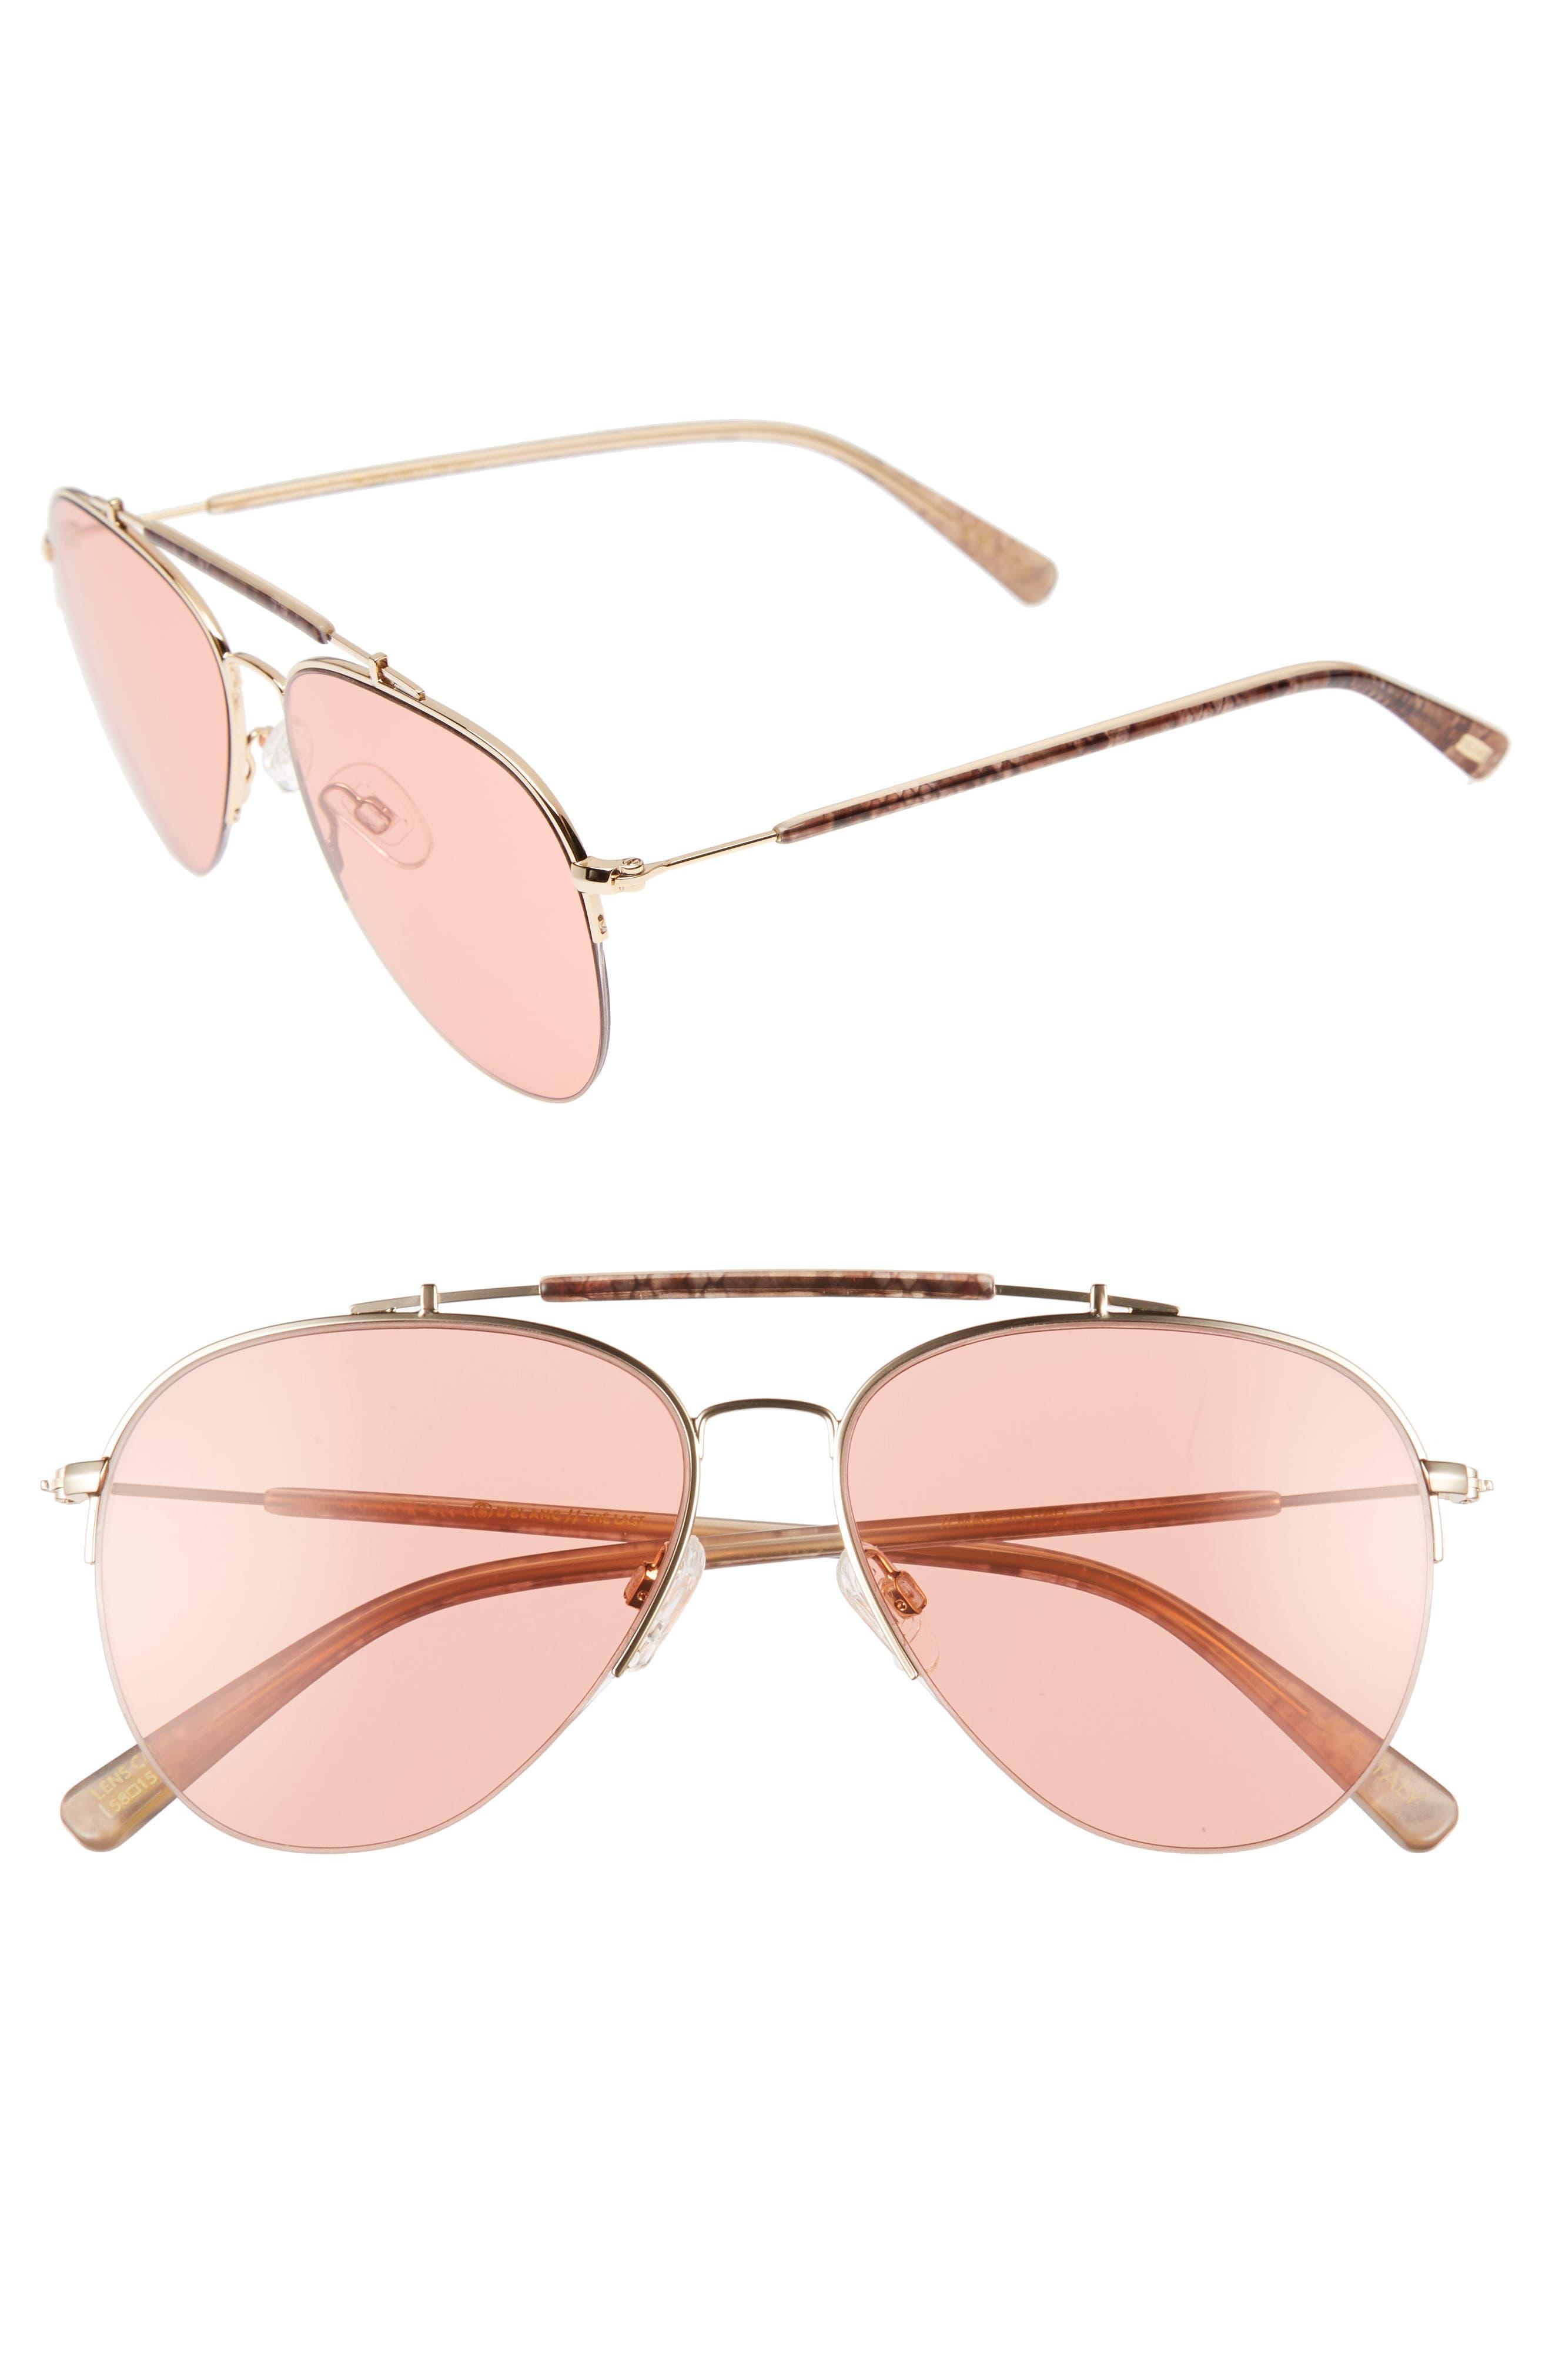 D'BLANC x Amuse Society The Last 58mm Aviator Sunglasses,                             Main thumbnail 1, color,                             Rattlesnake/ Persimmon